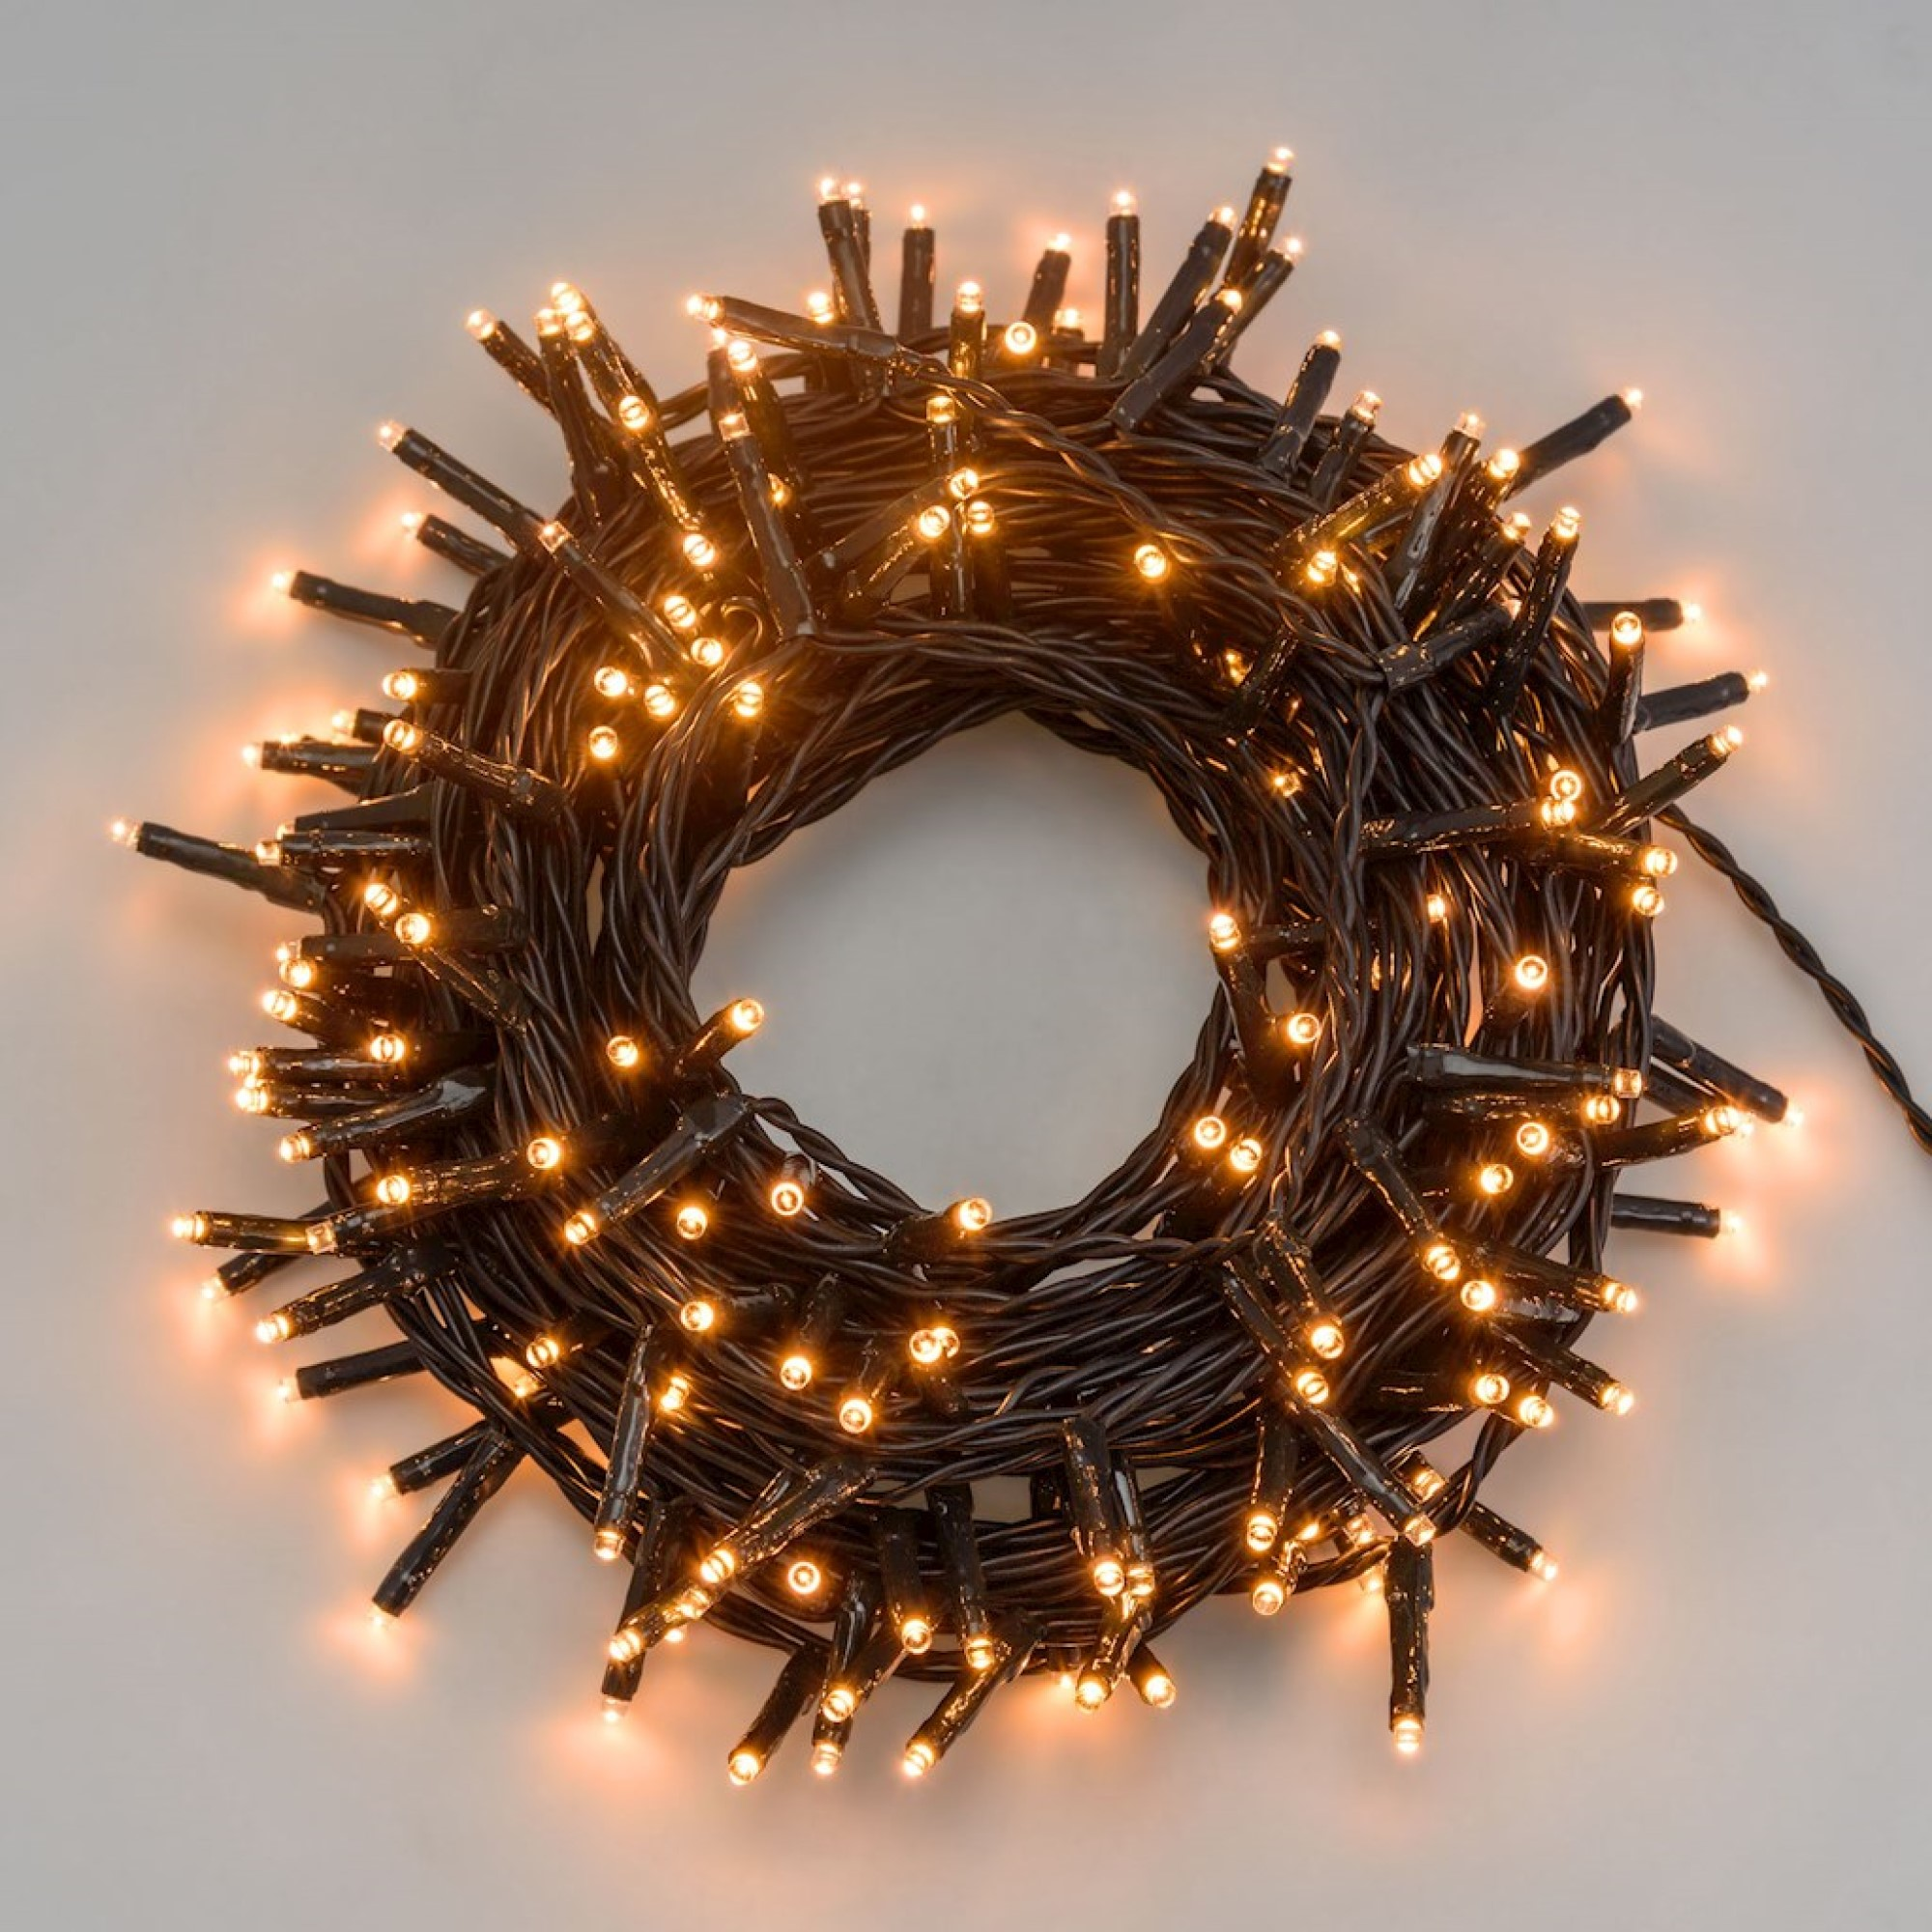 Lotti LED-Lichterkette, warmweiß, 360 LEDs, 29m (inkl. 4m Zuleitung) 41721